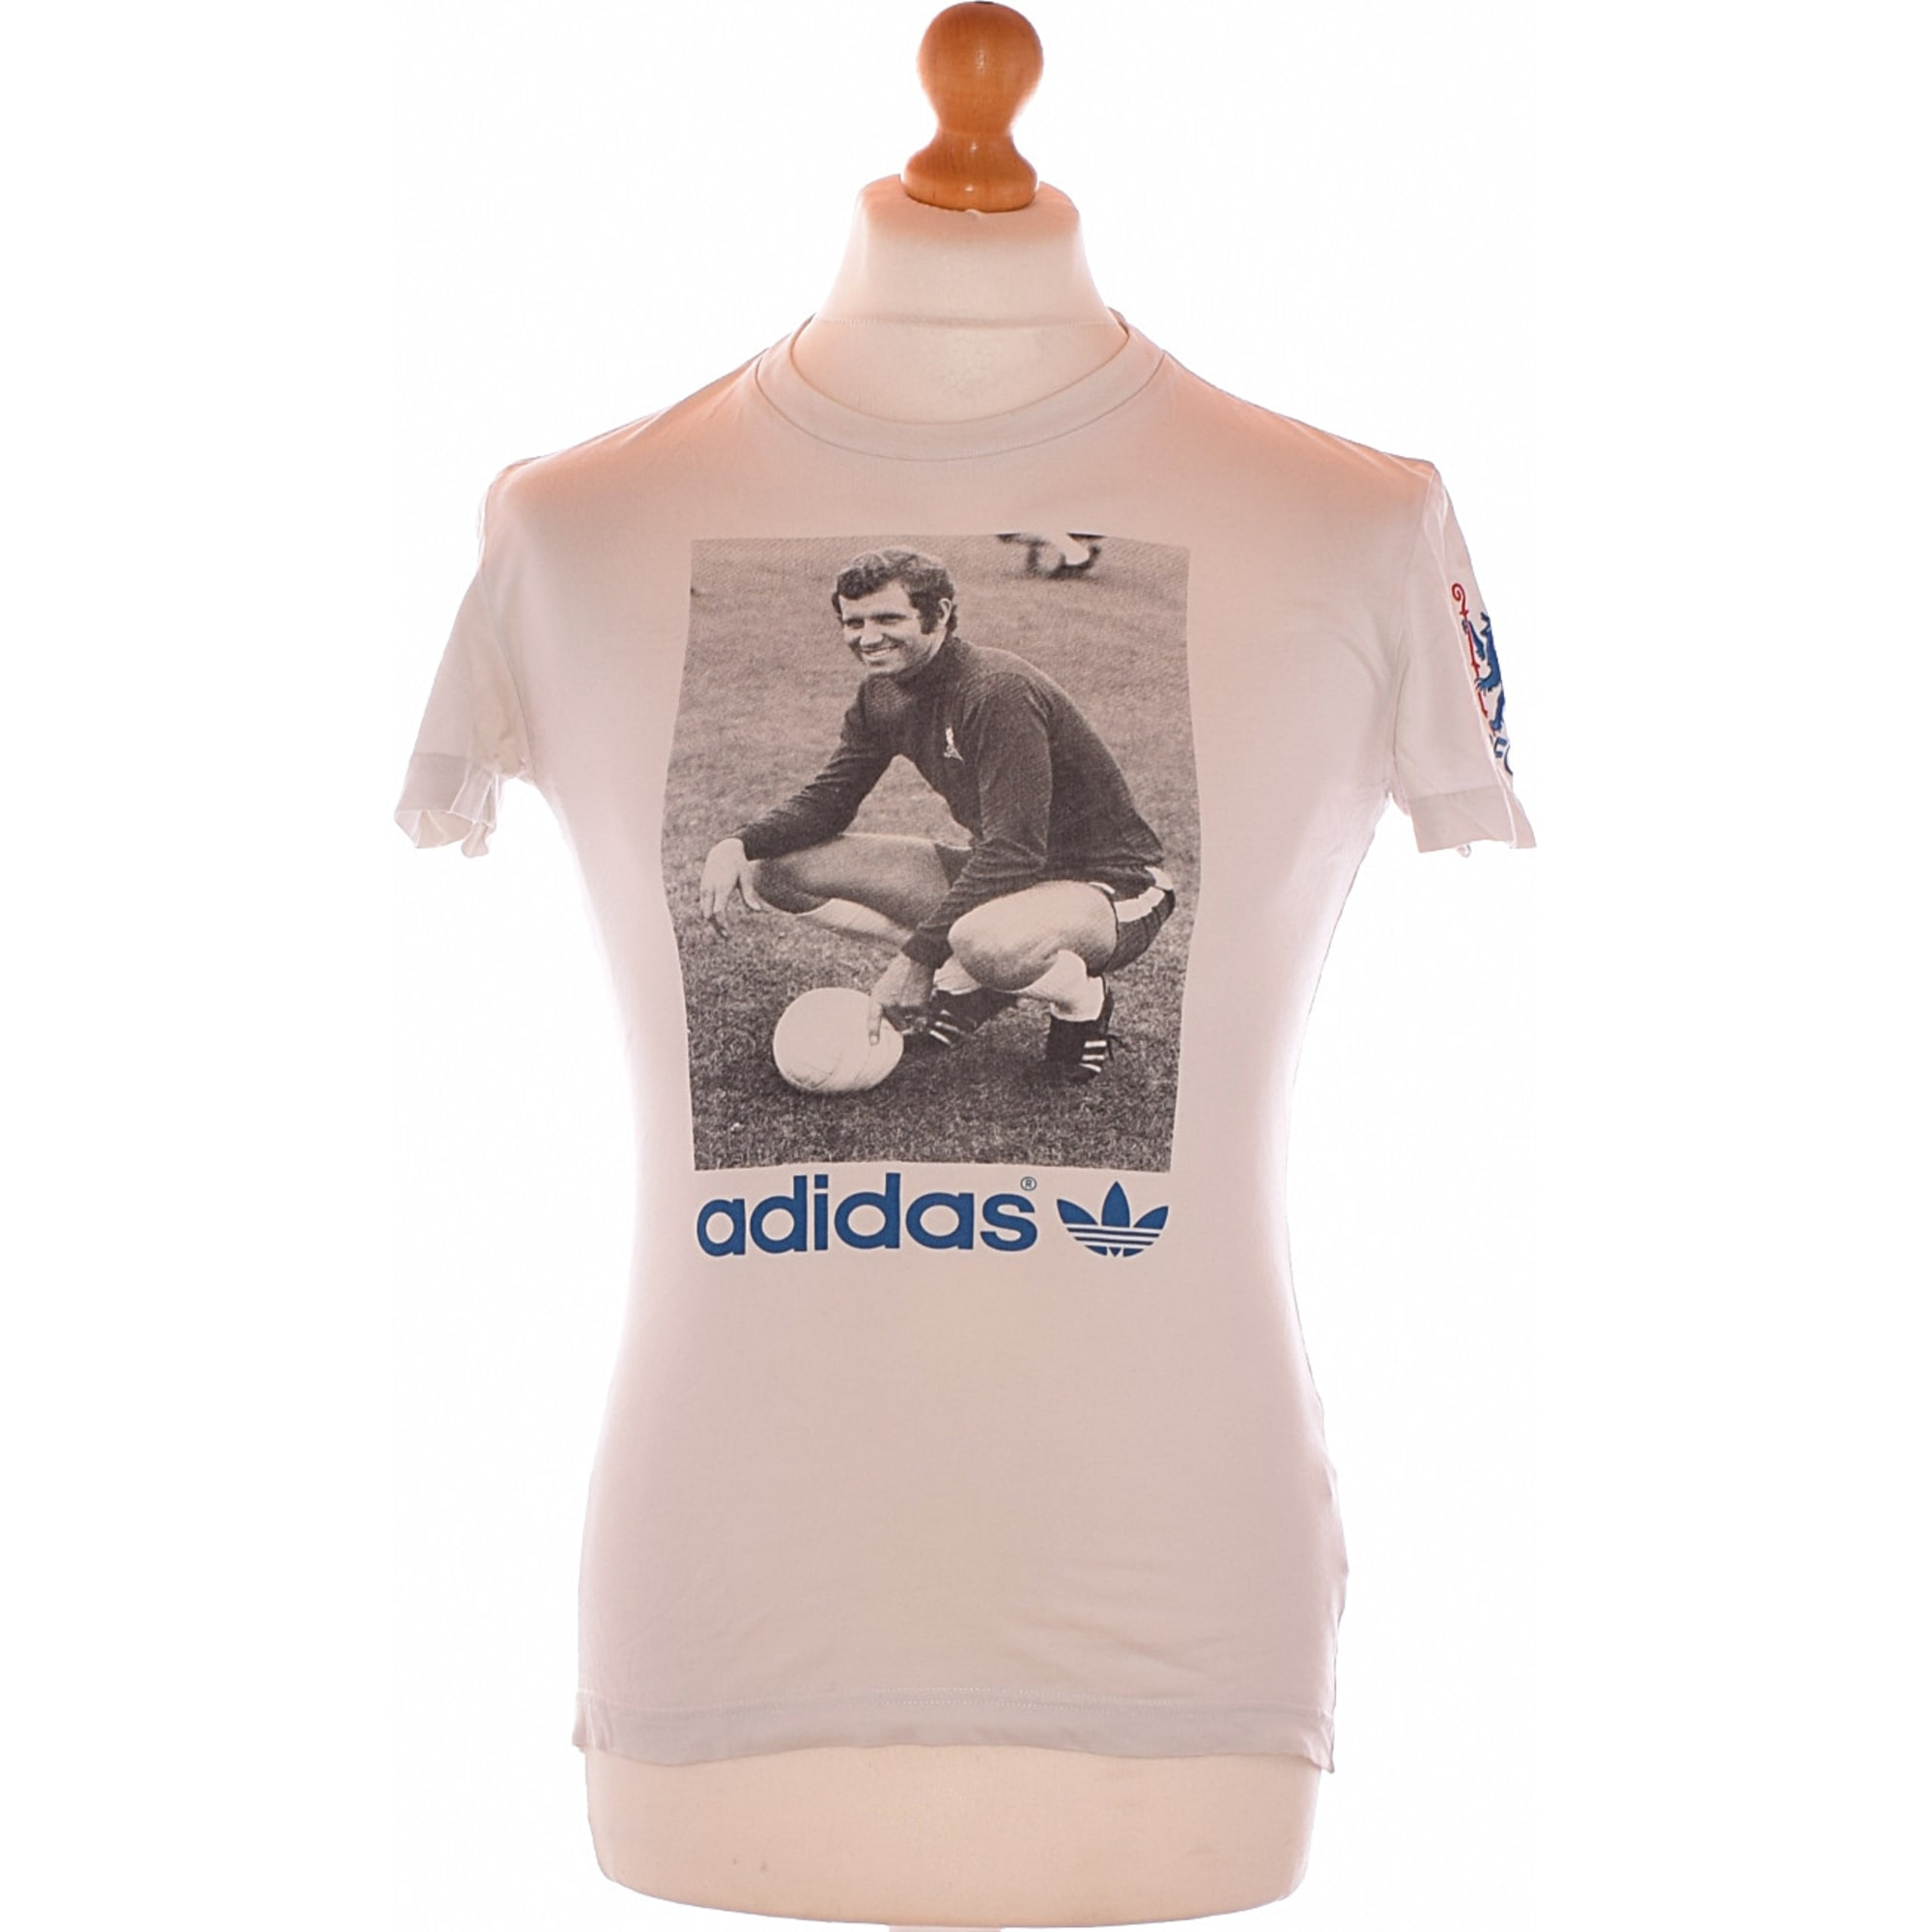 Tee Shirt Adidas Blanc 2